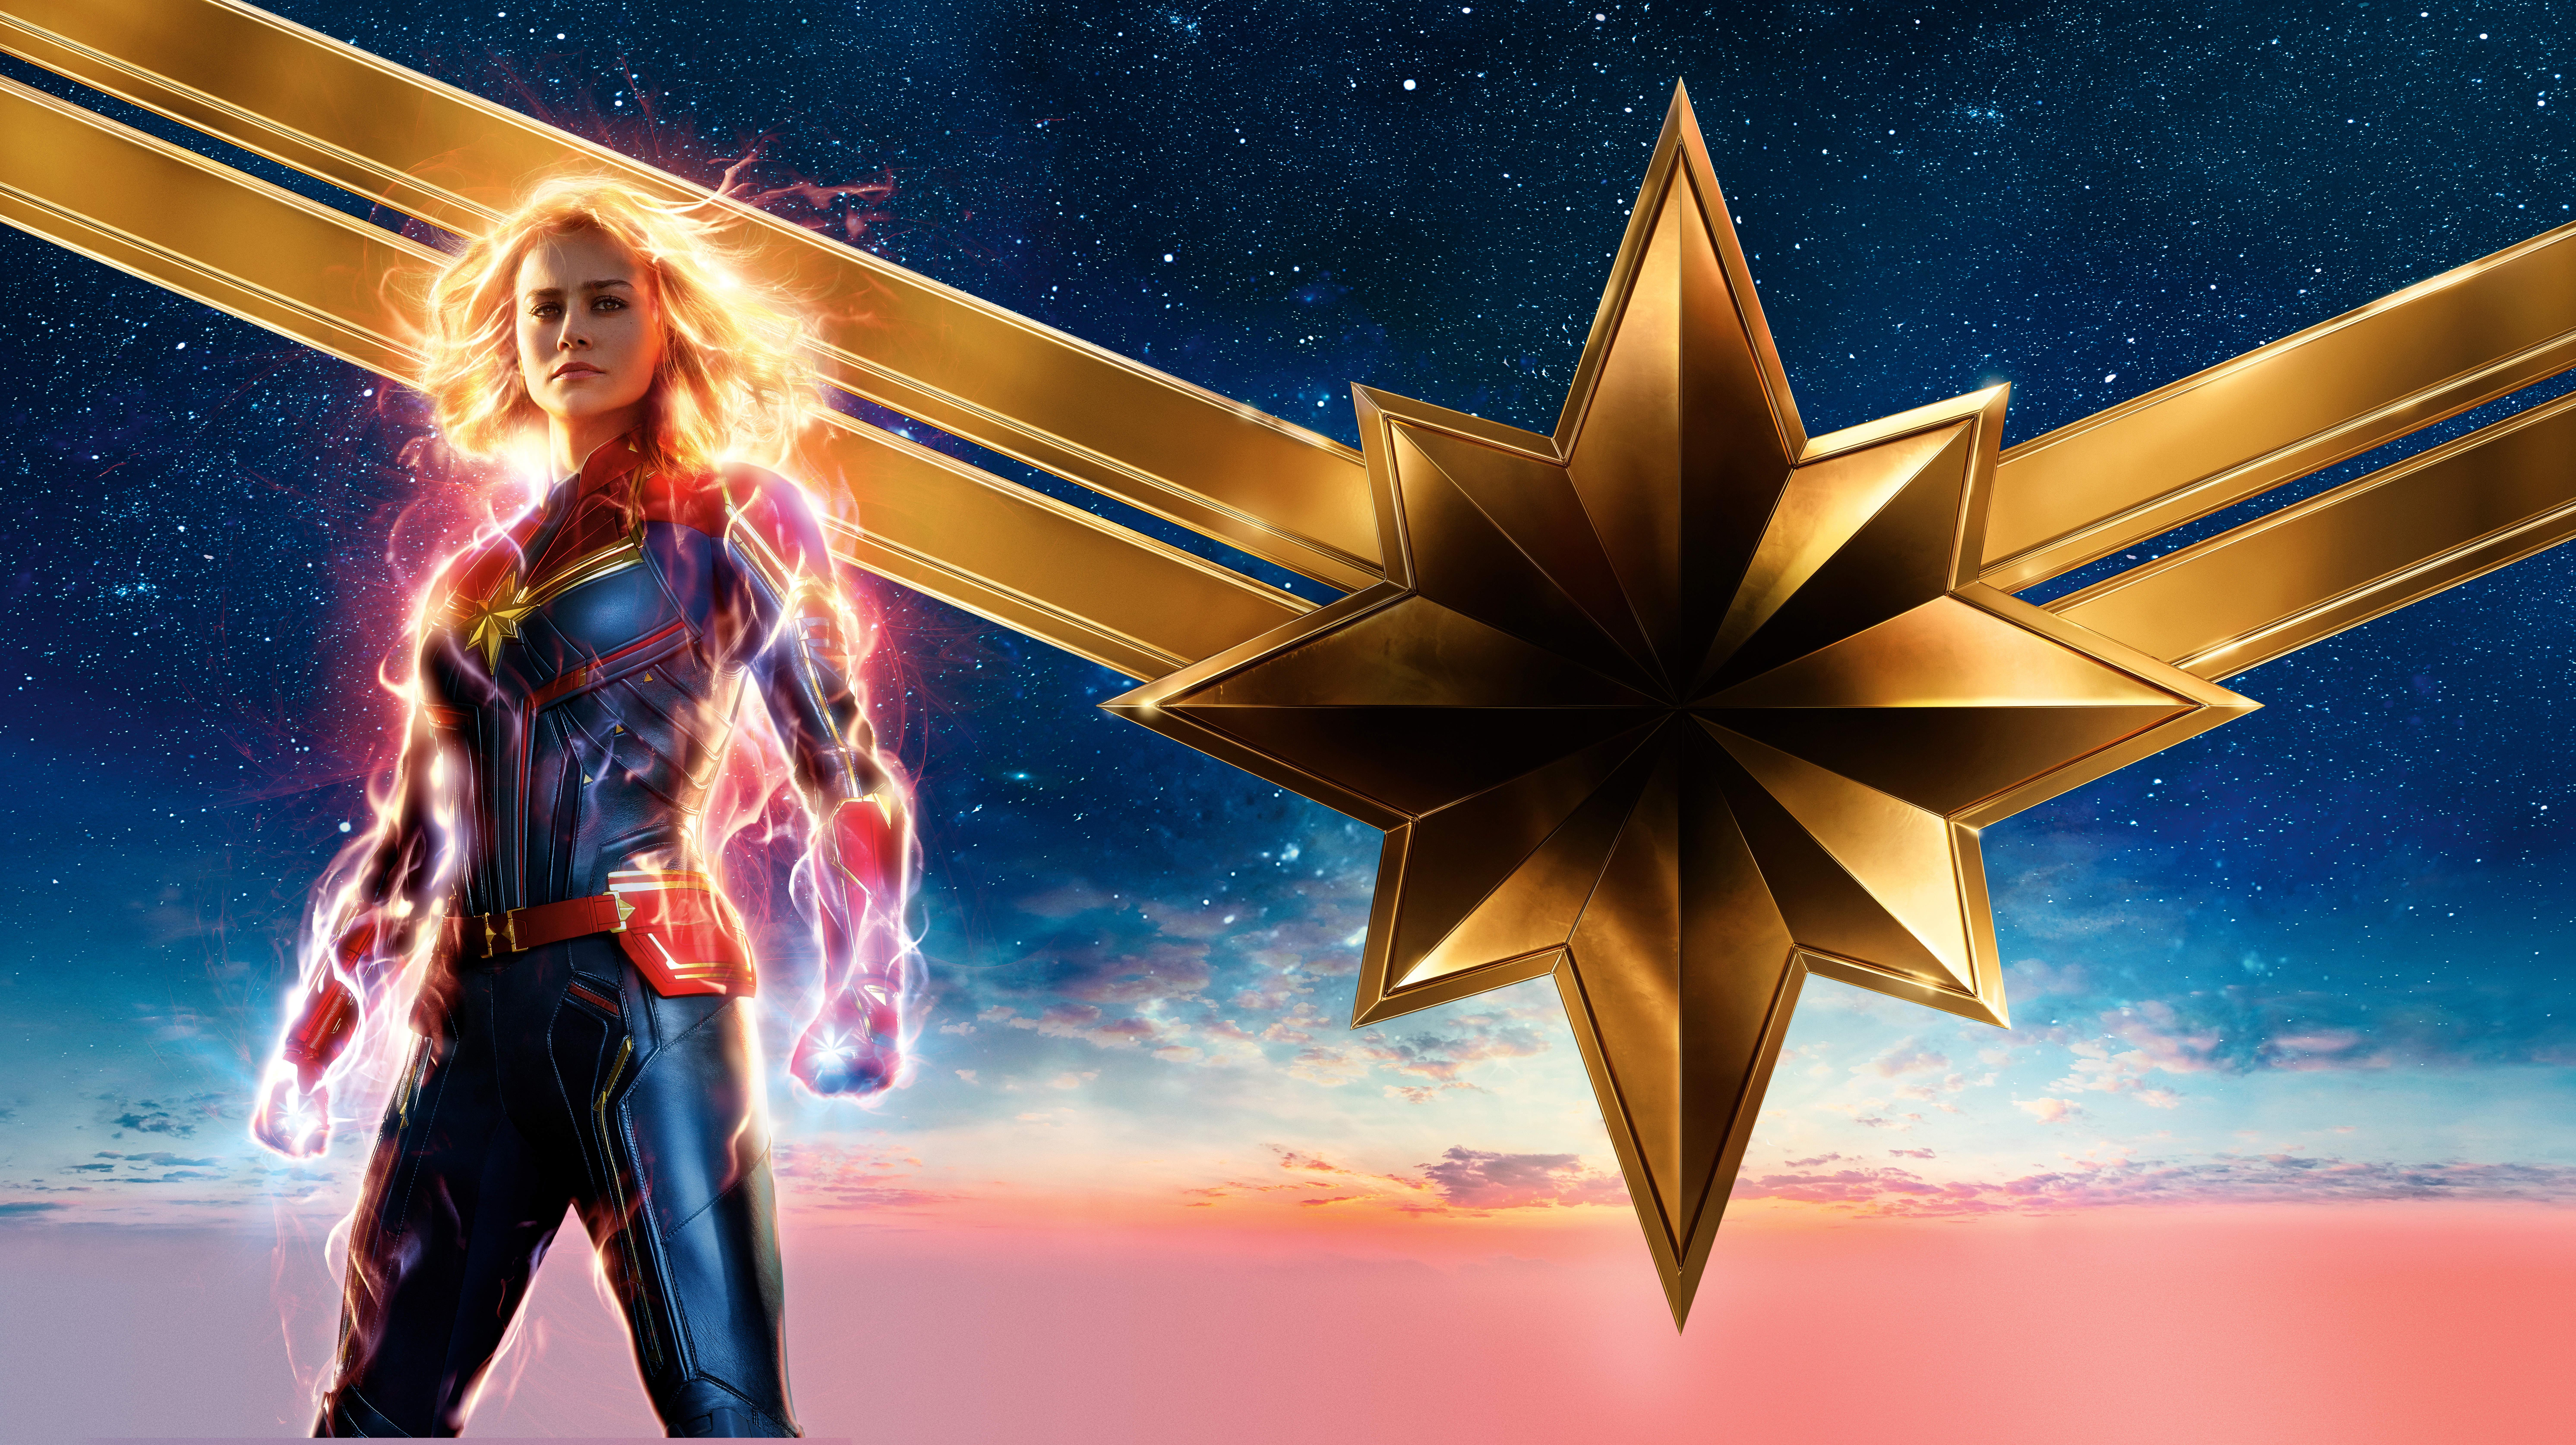 2019 New Captain Marvel Poster Wallpaper, HD Movies 4K ...